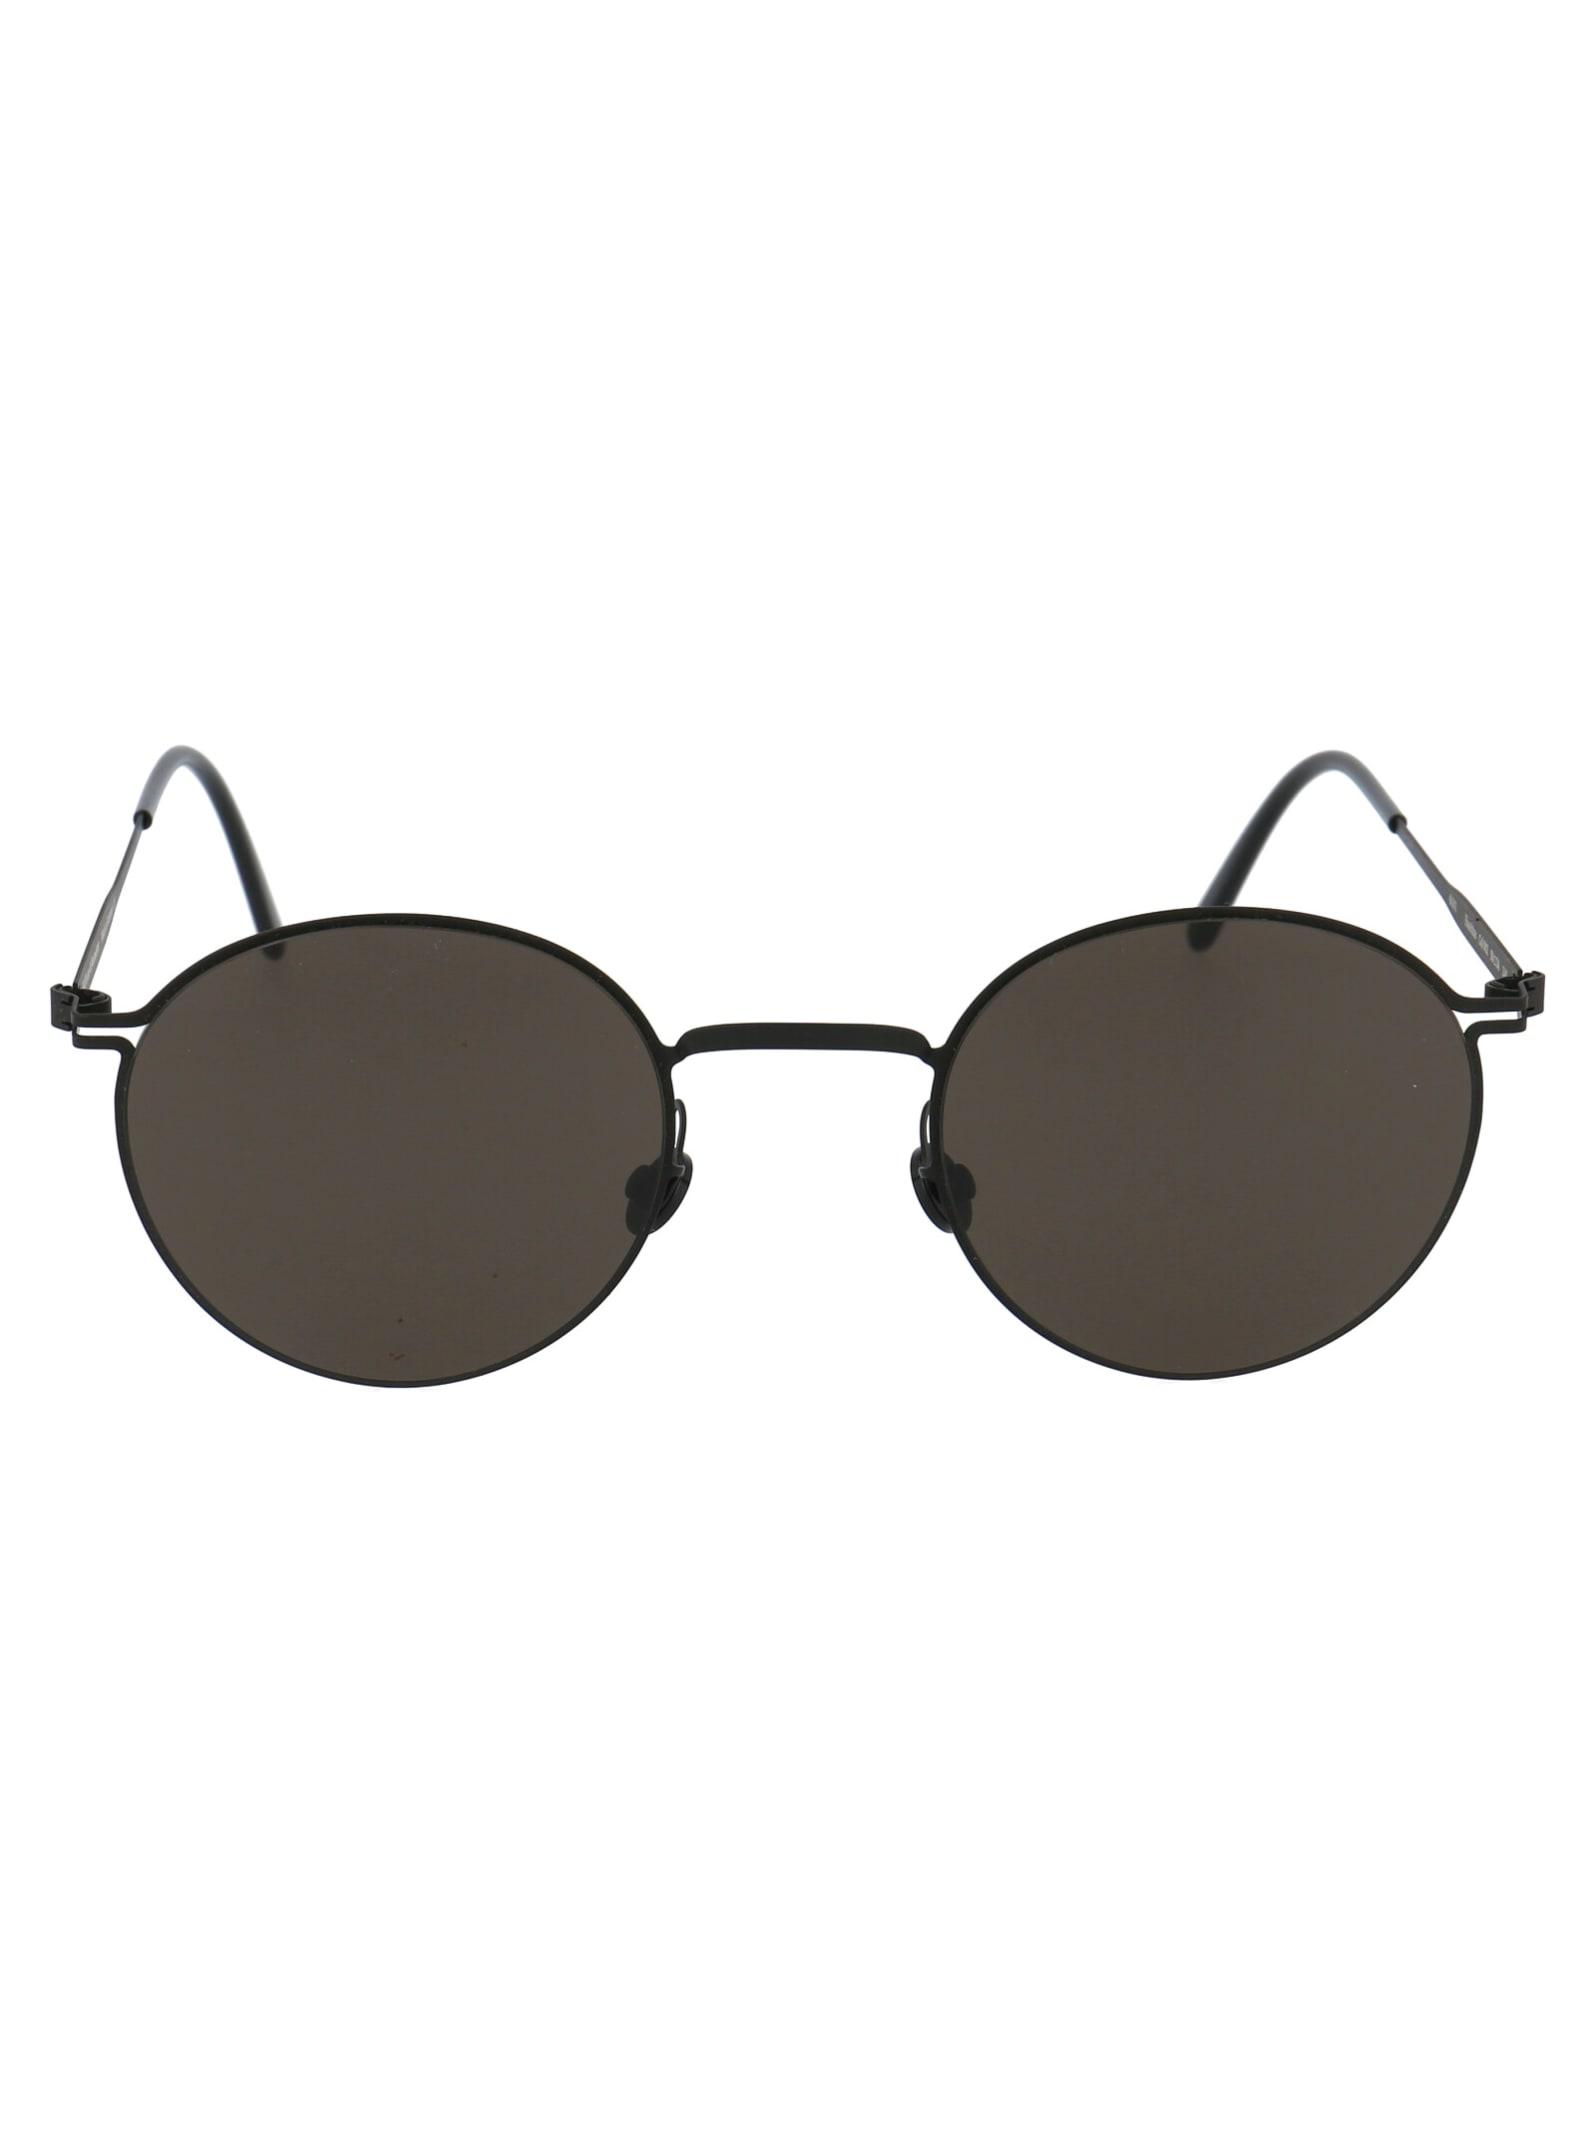 Hazeltine Sunglasses